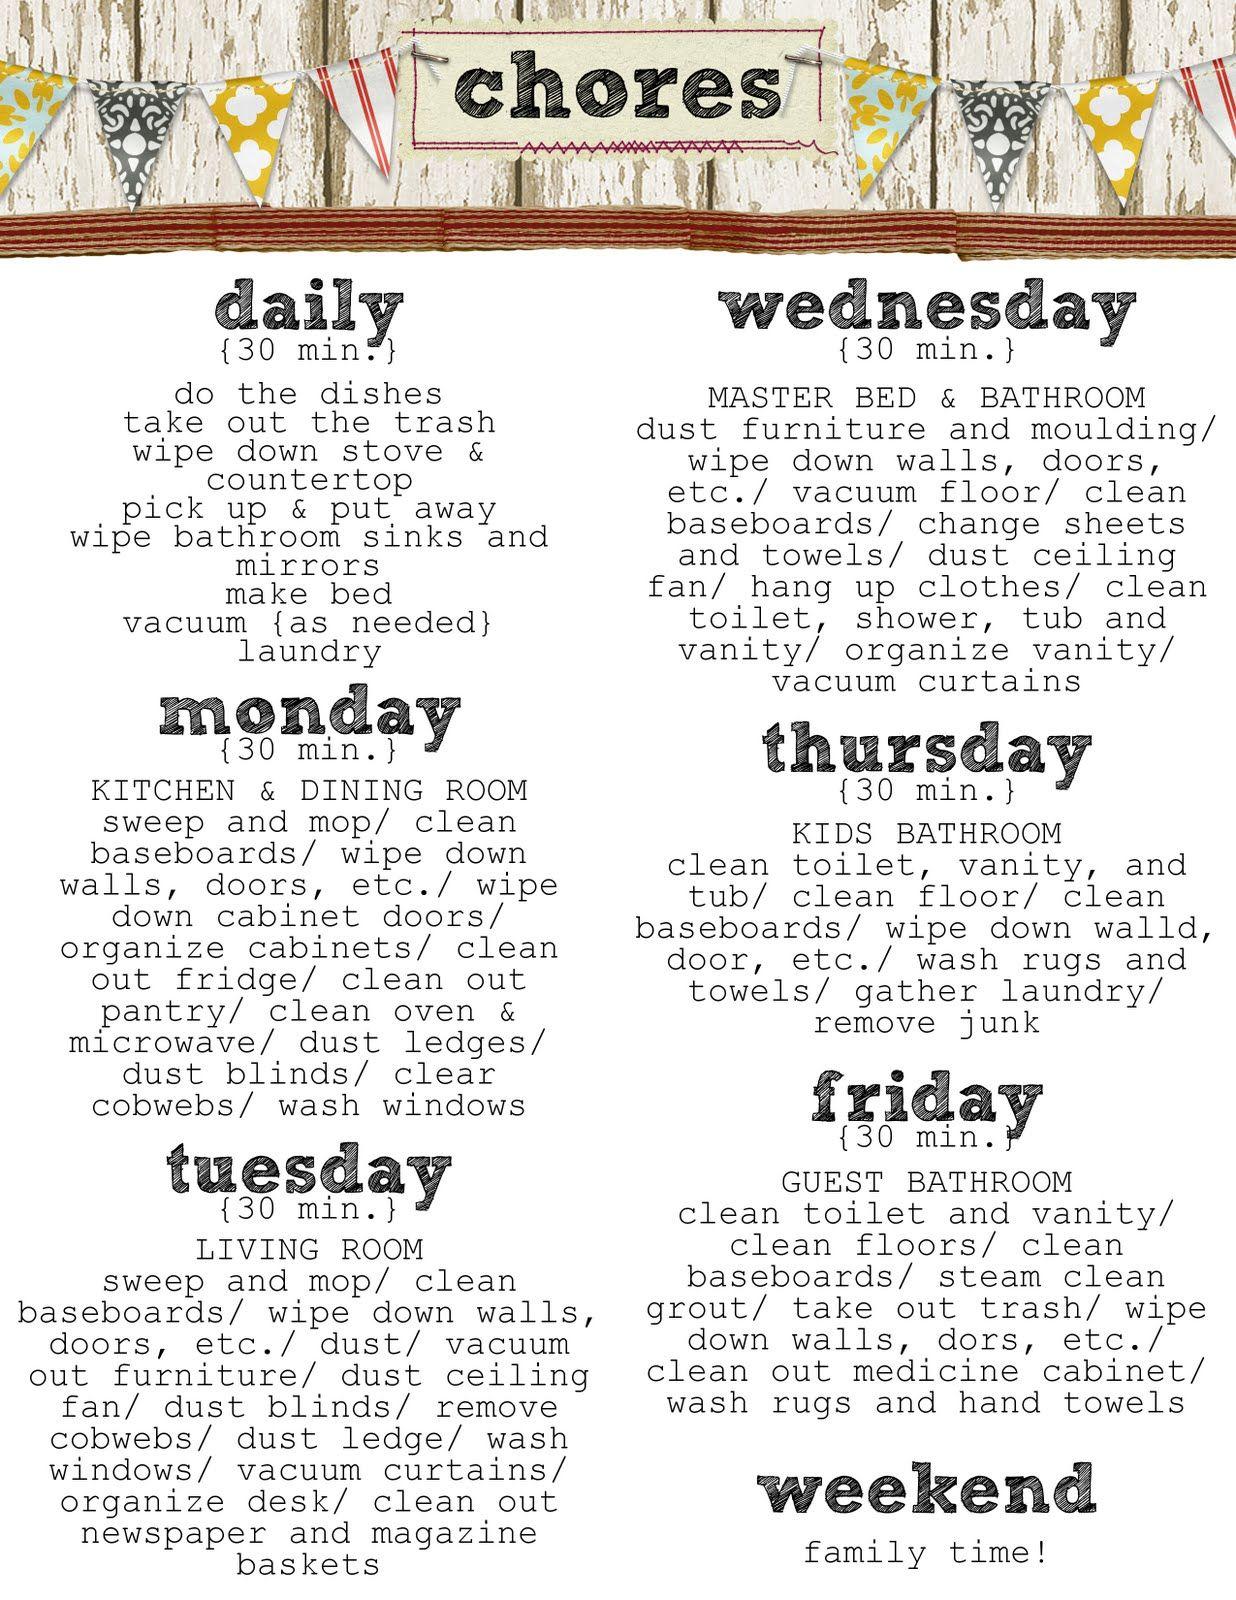 weekly chores list printable